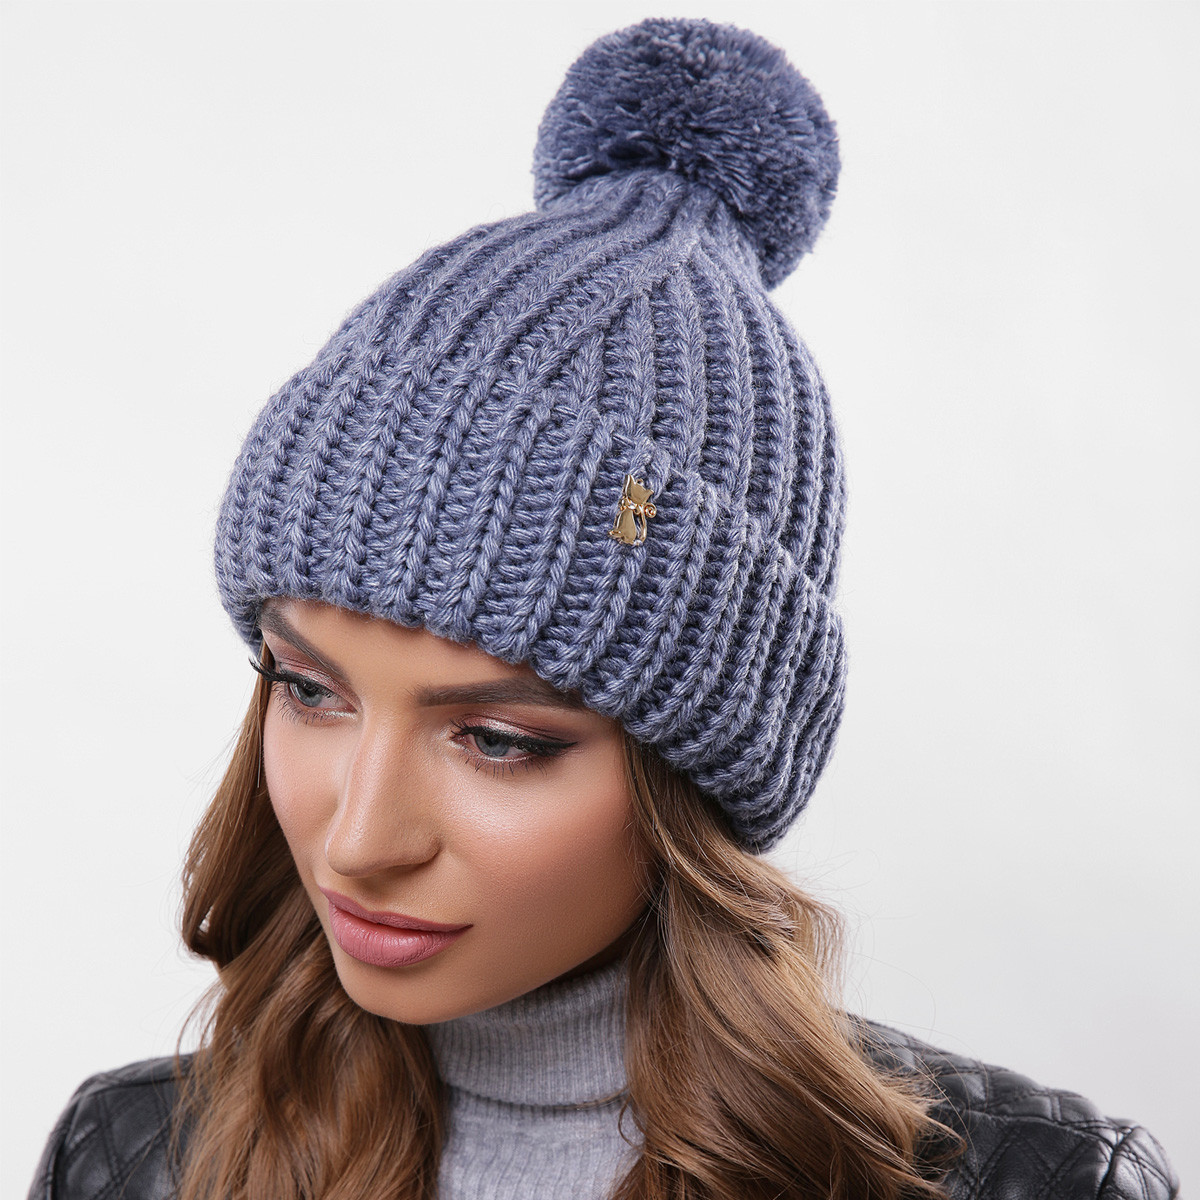 Шапка вязаная синяя теплая зимняя